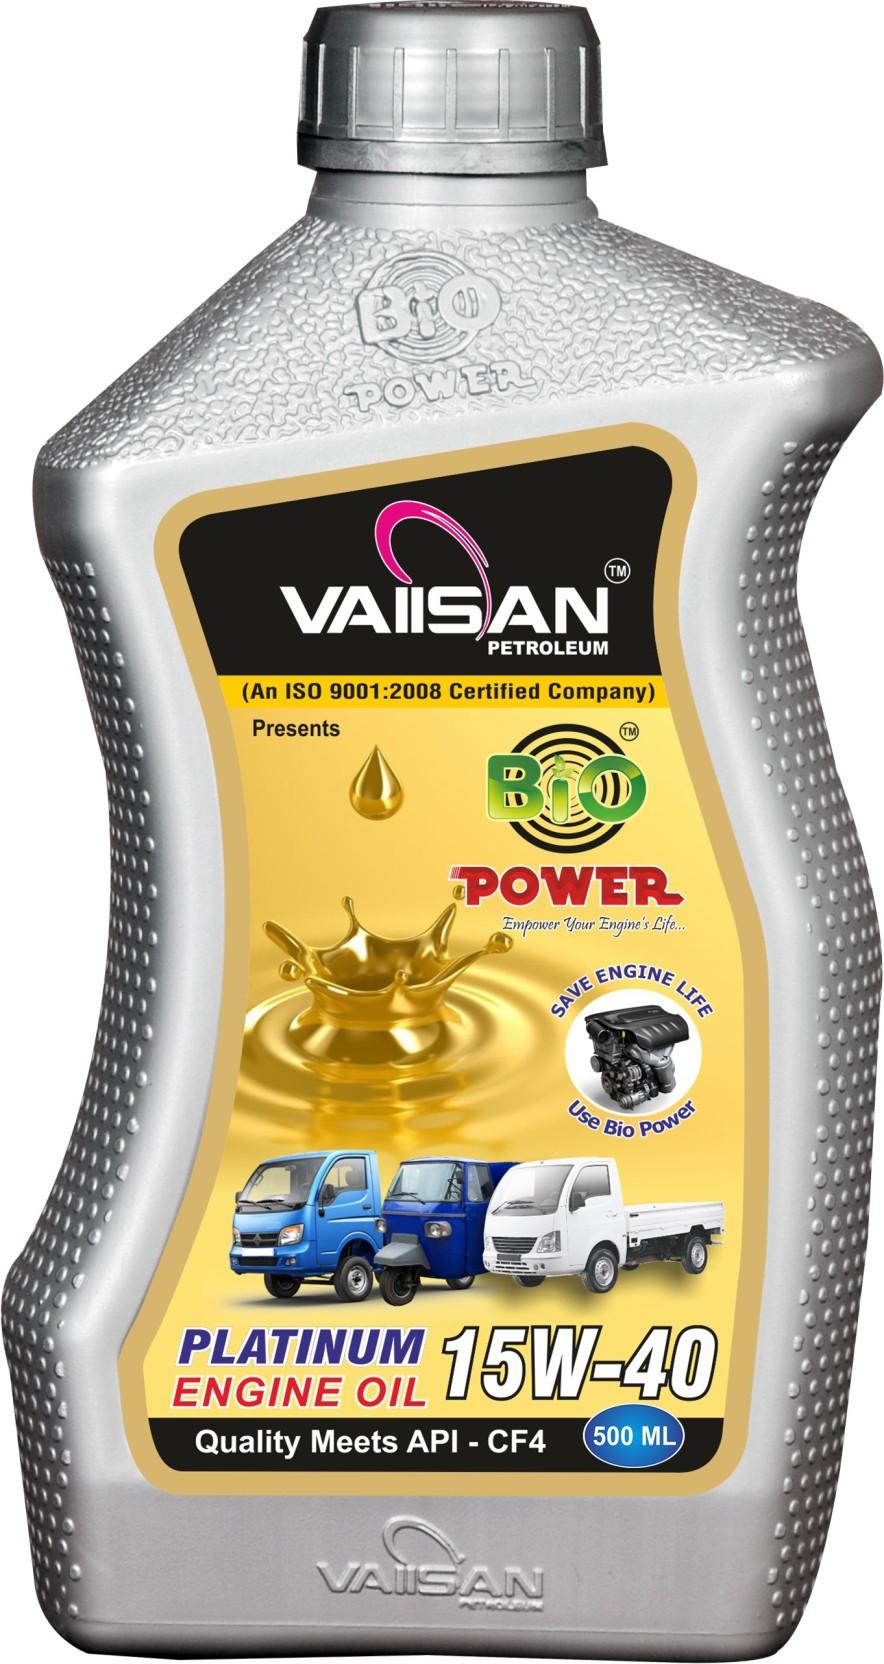 Vaiisan Engine Oil Additive Price in India - Buy Vaiisan Engine Oil